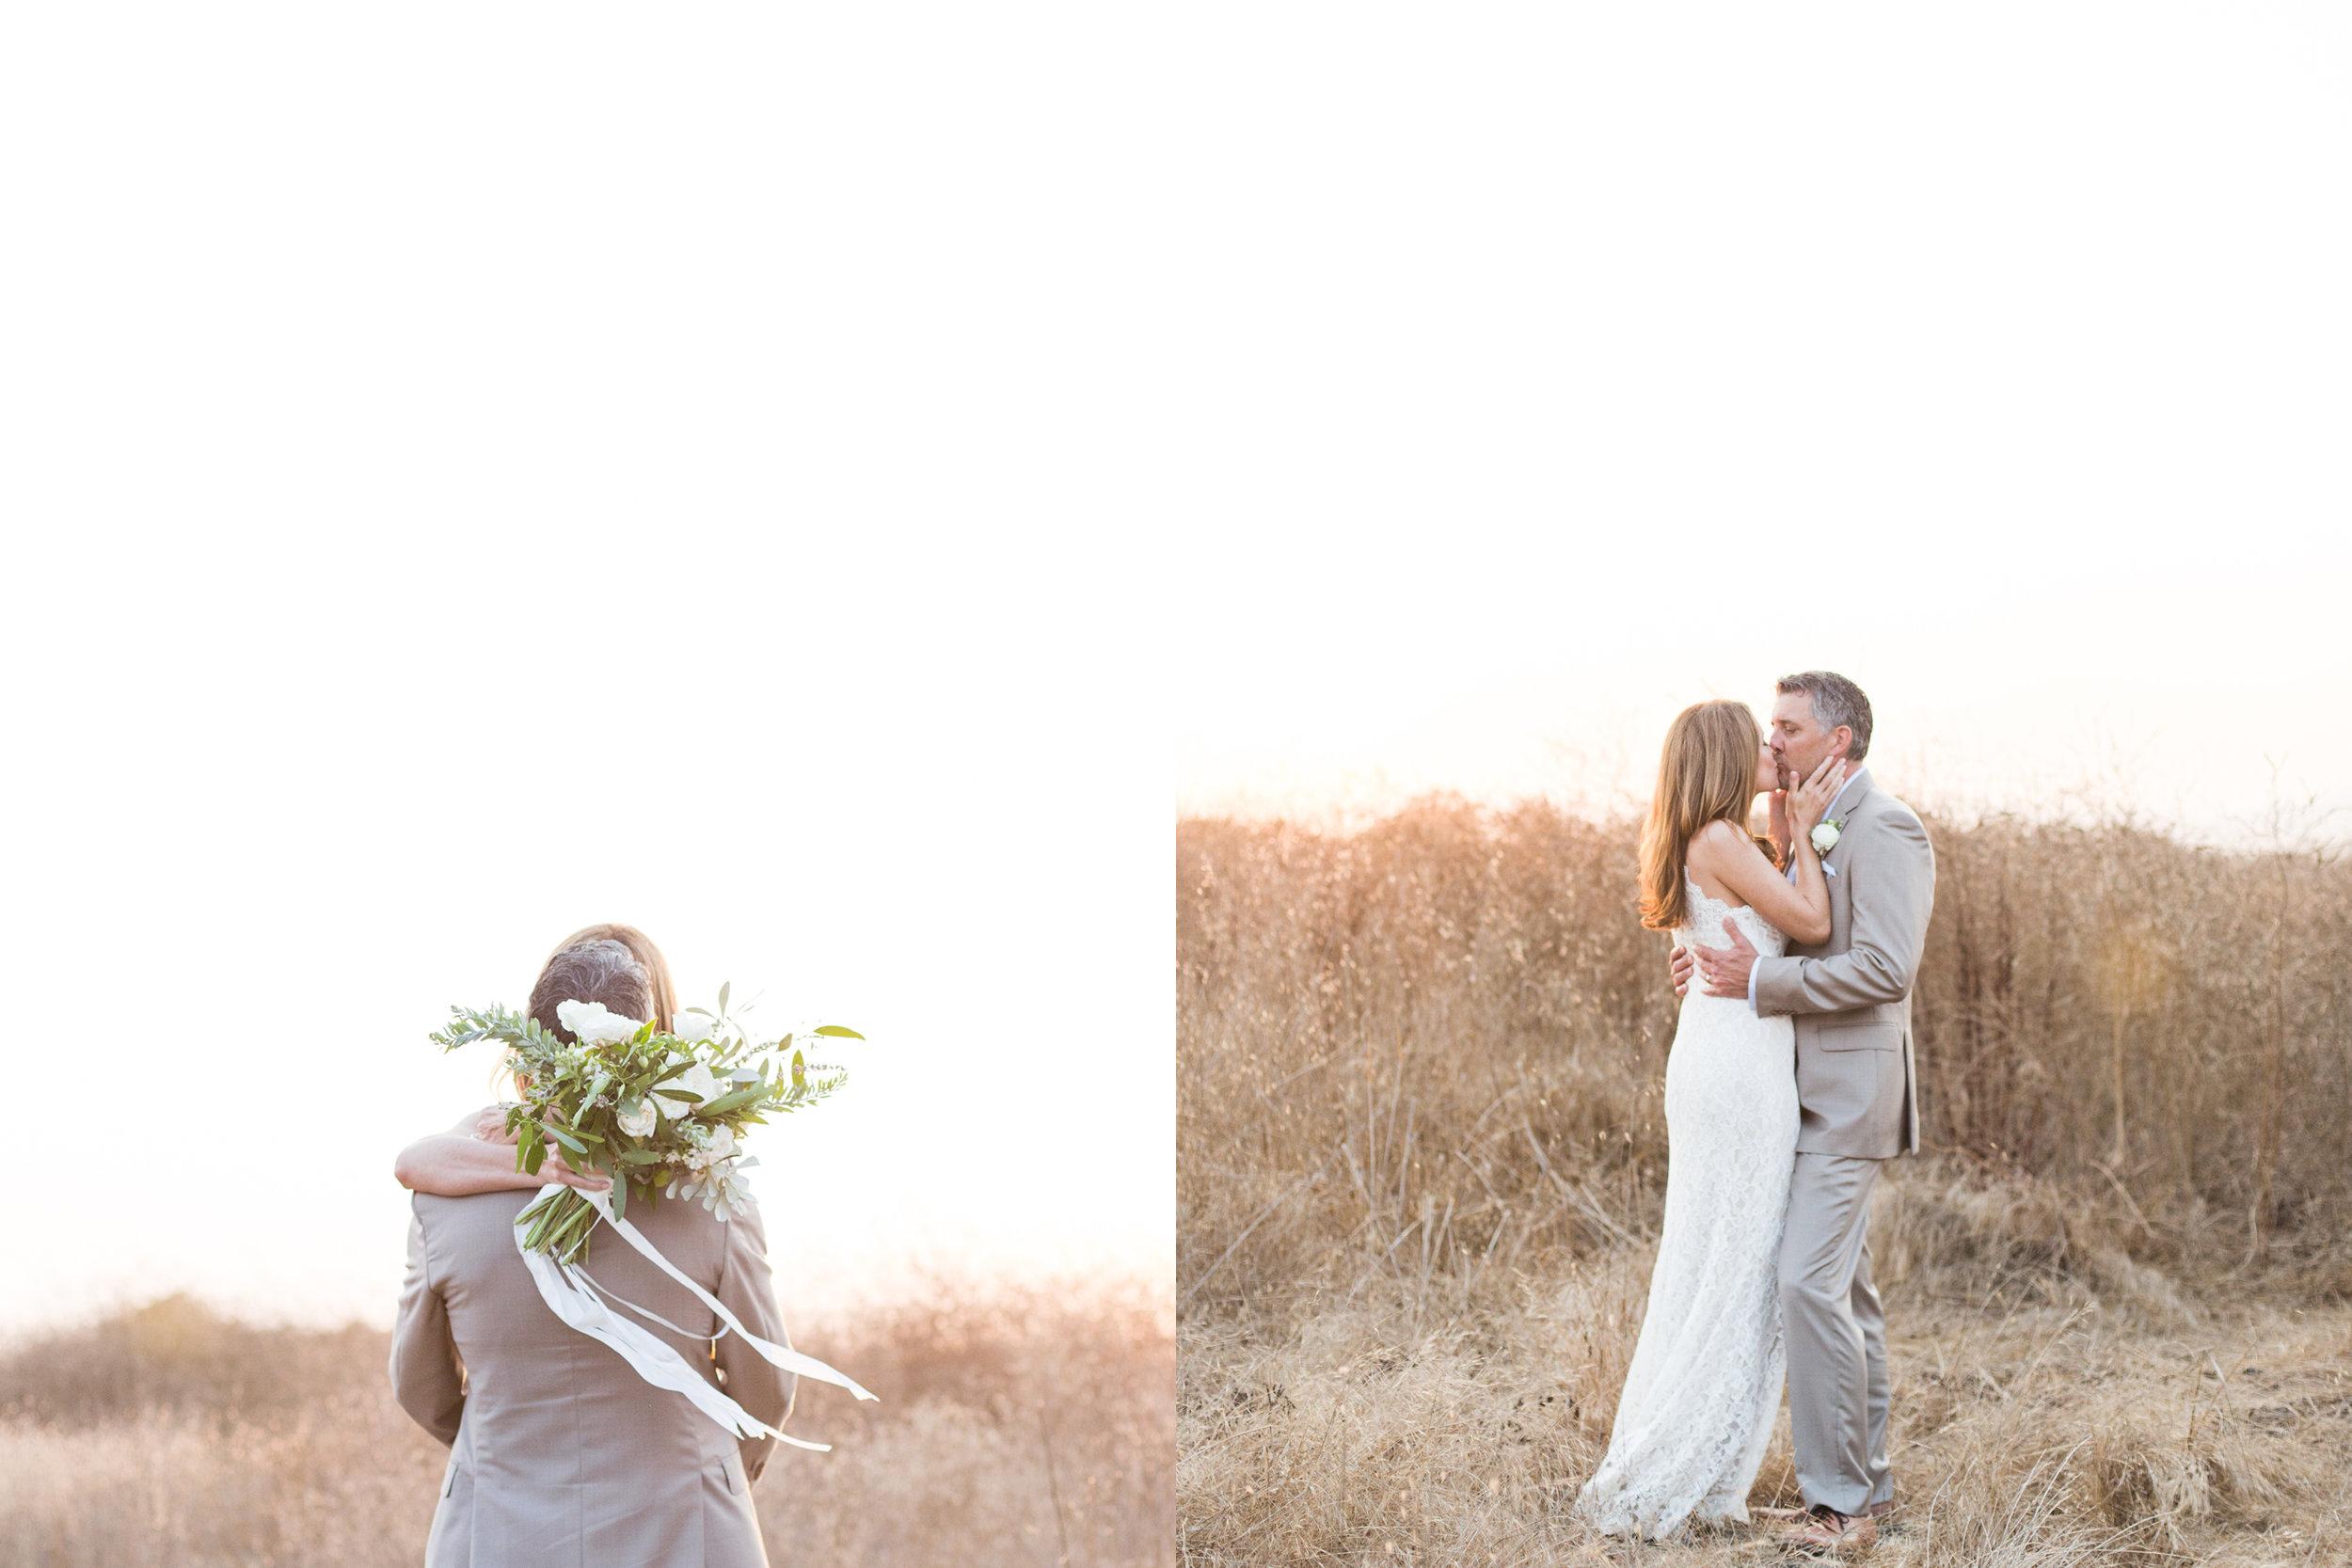 santa-barbara-elopement-elope-wedding-planner-coordinator-coordination-day-of-intimate-rustic-ellwood-bluffs-forest-beach-ocean-view-green-white-event (20).jpg